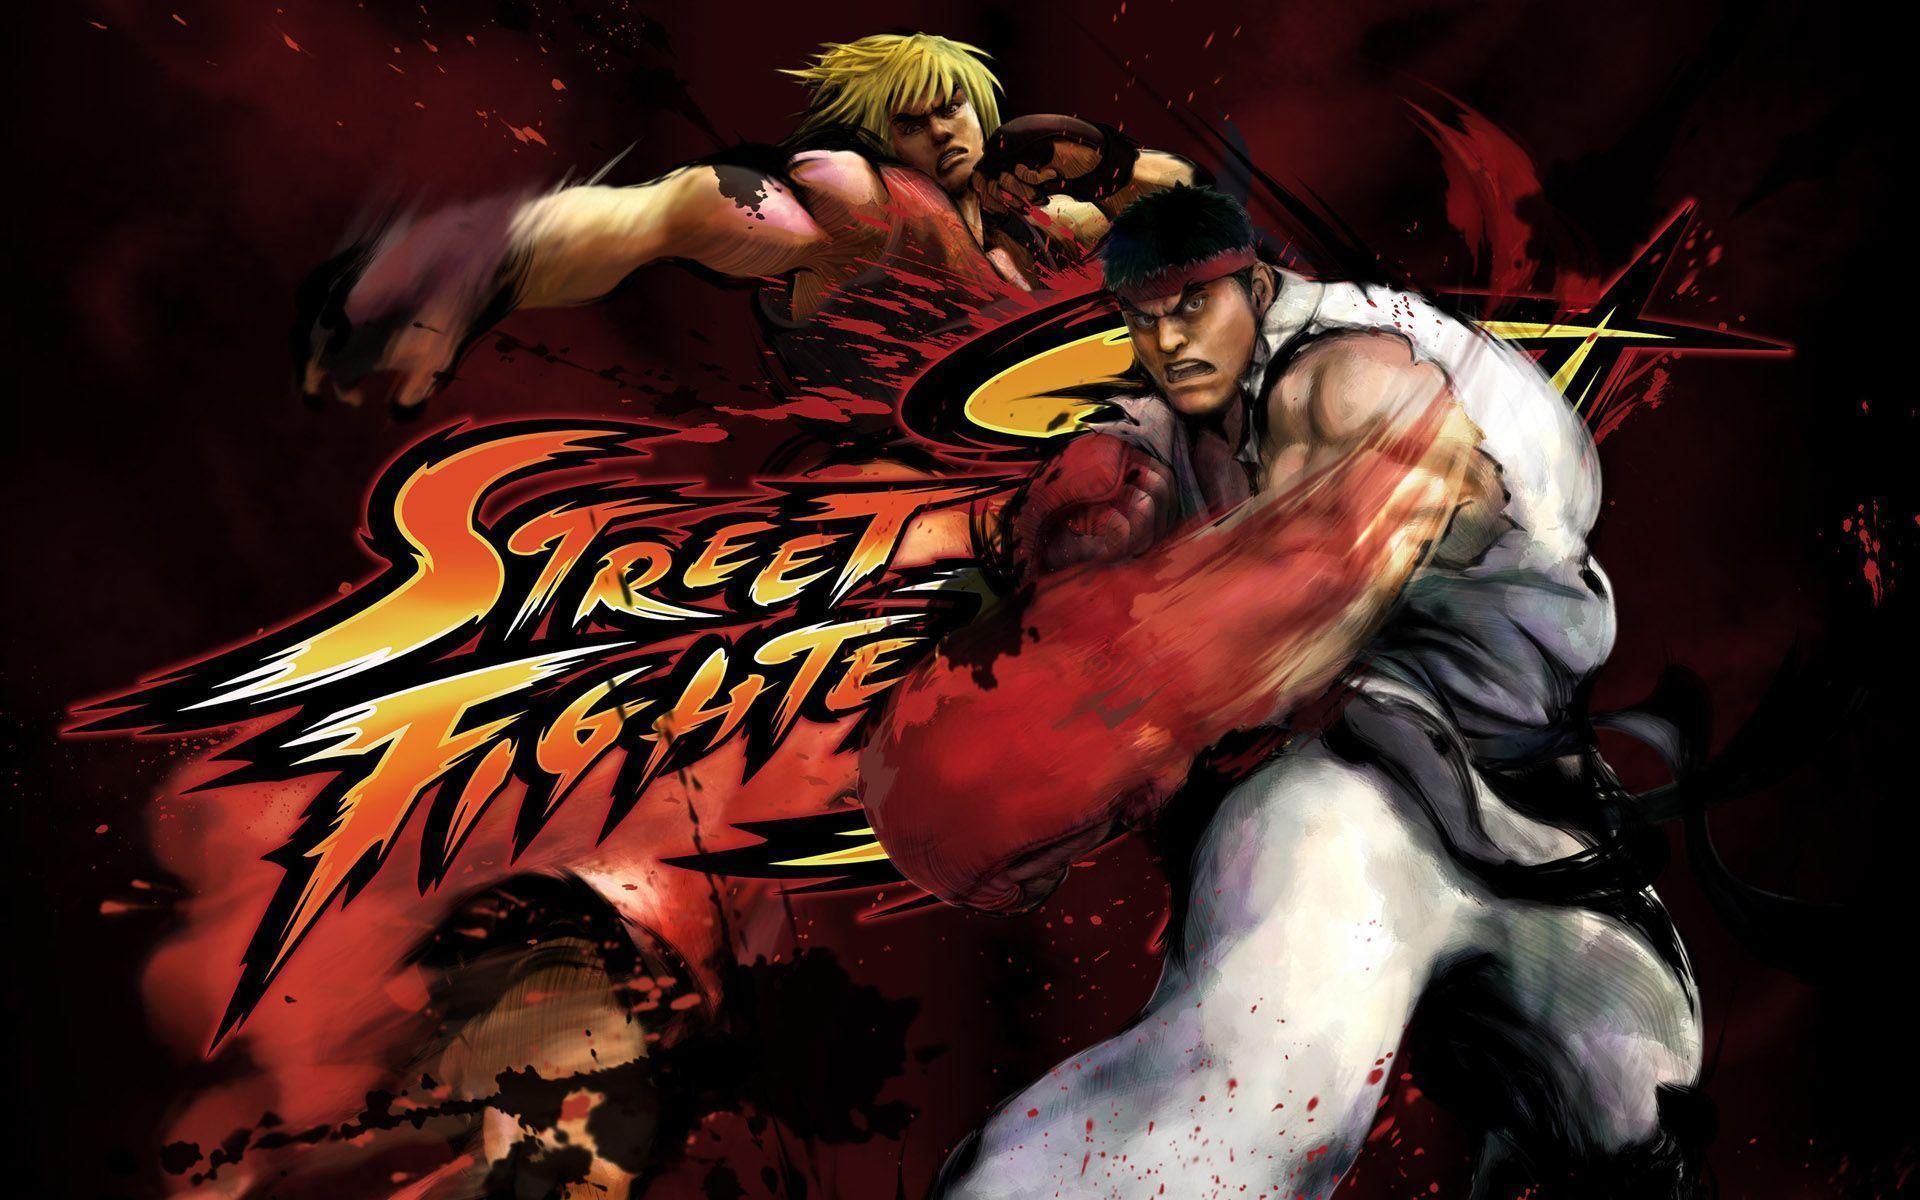 Street Fighter 5 Wallpaper: Street Fighter Wallpapers